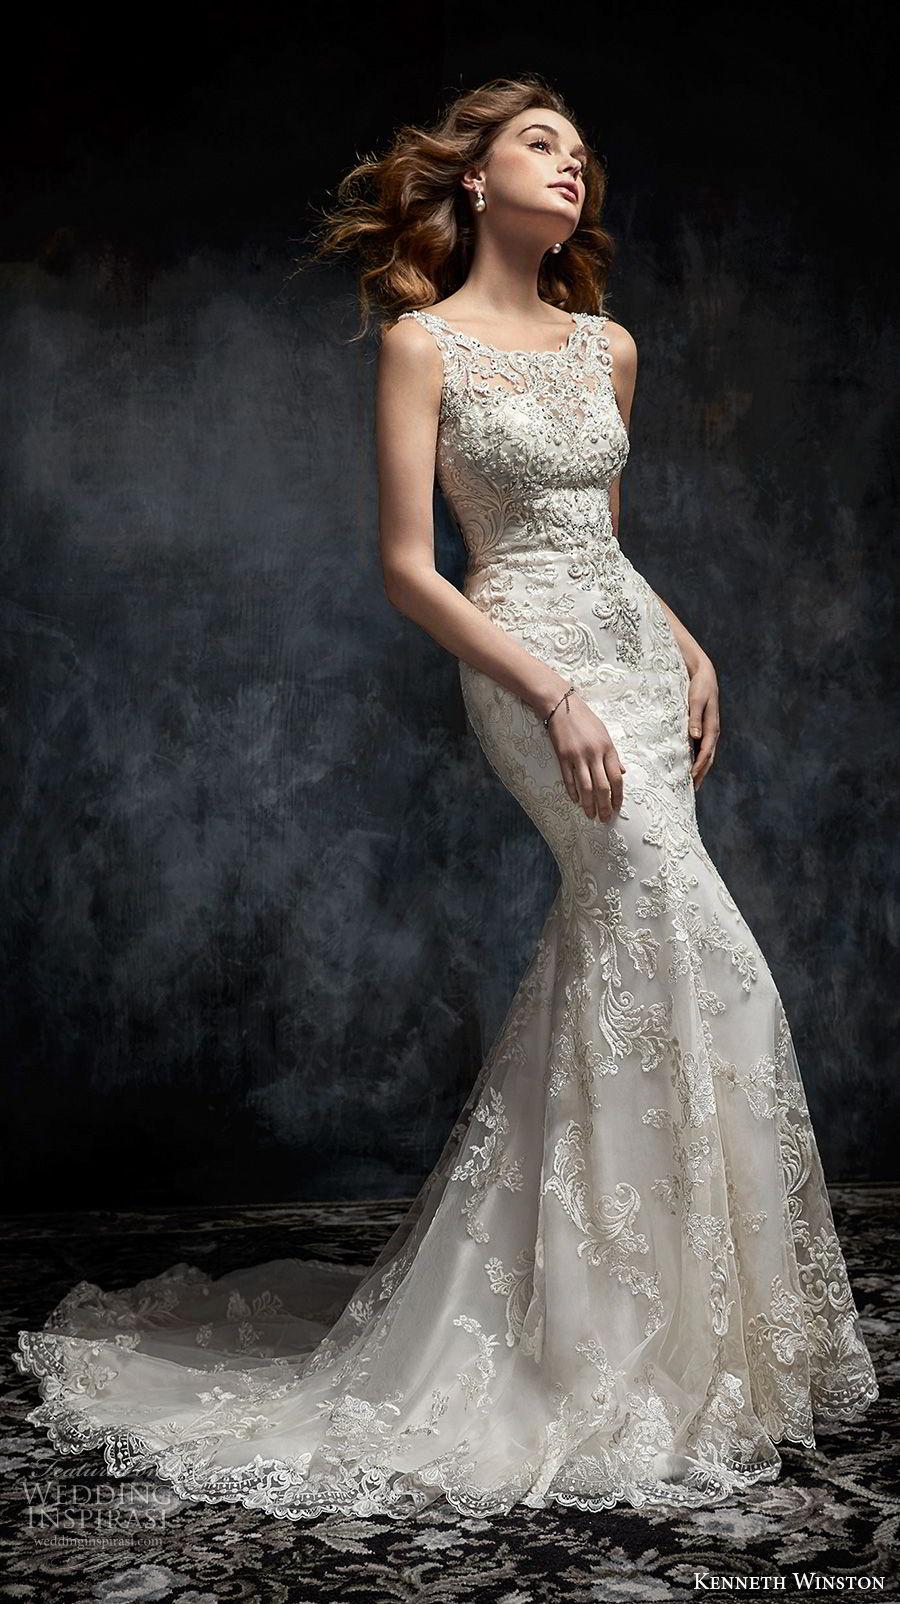 kenneth winston fall 2017 bridal sleeveless bateau neckline full embellishment elegant fit and flare sheath wedding dress open back medium train (30) mv